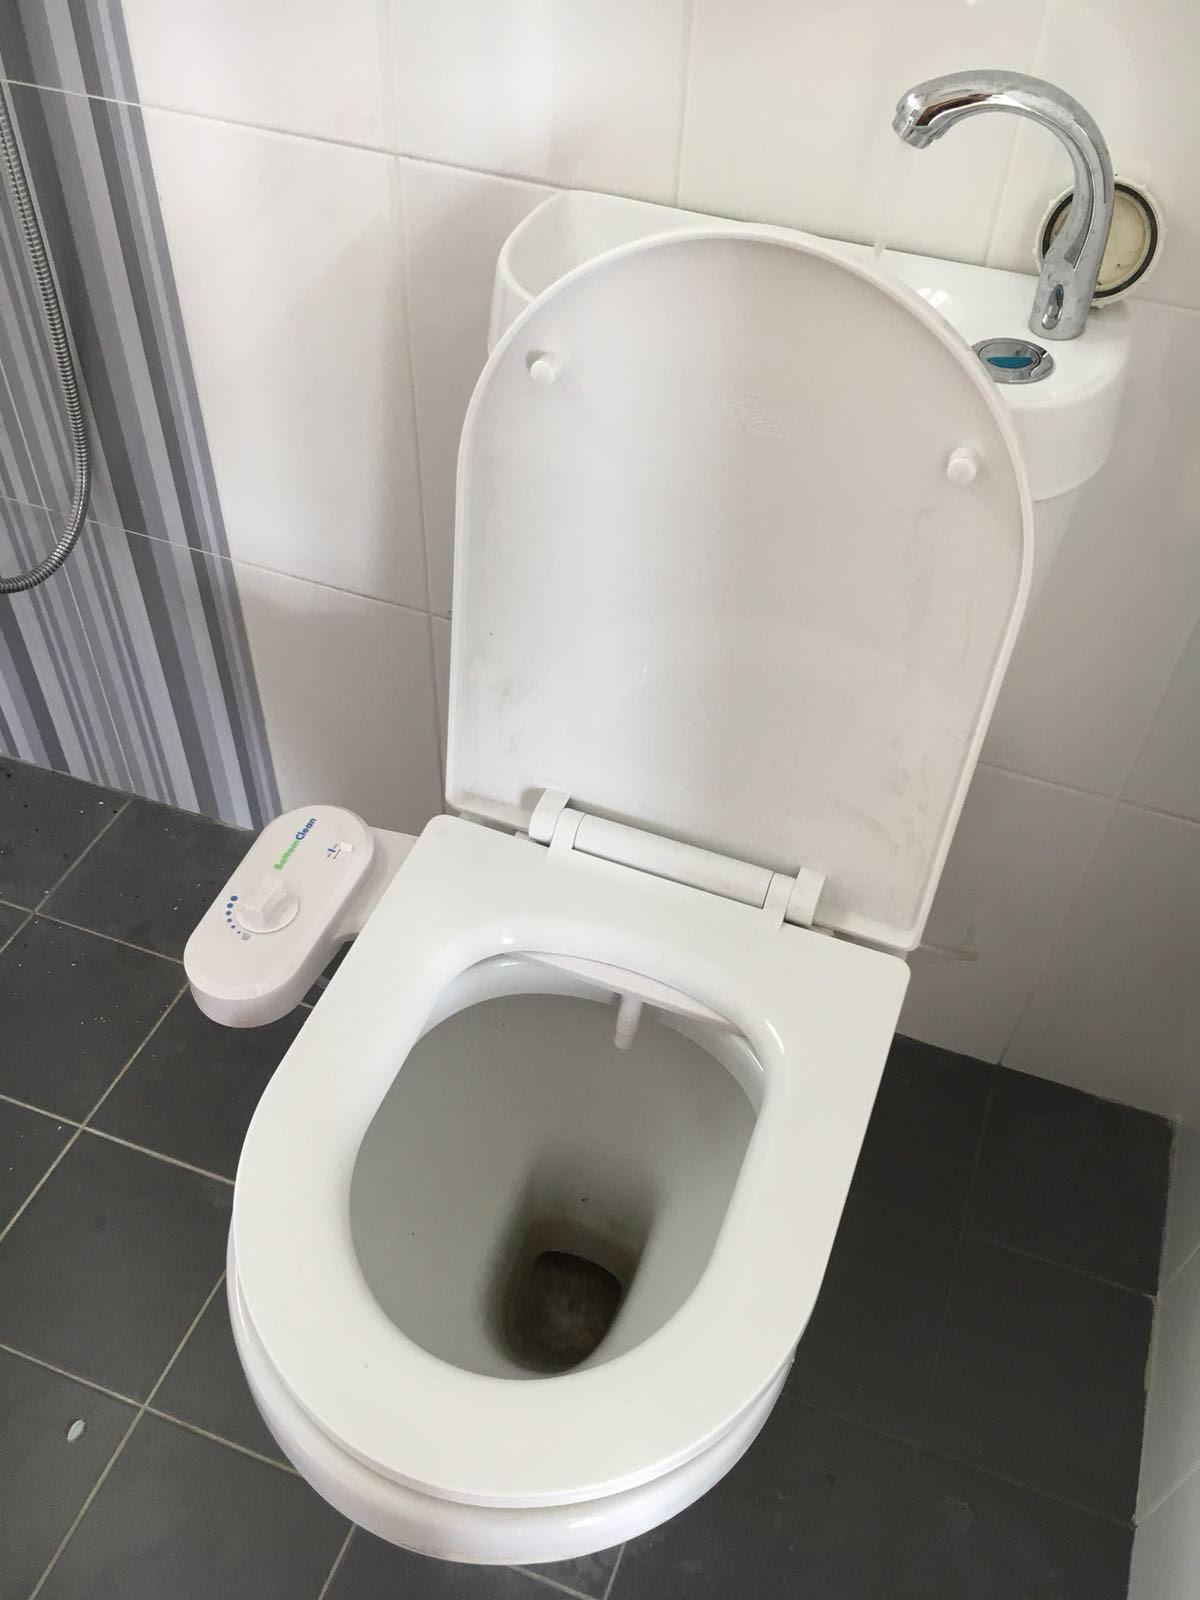 Hdb Luxury White Toilet Bidet X 1 Unit By M Living Home Furnishing.